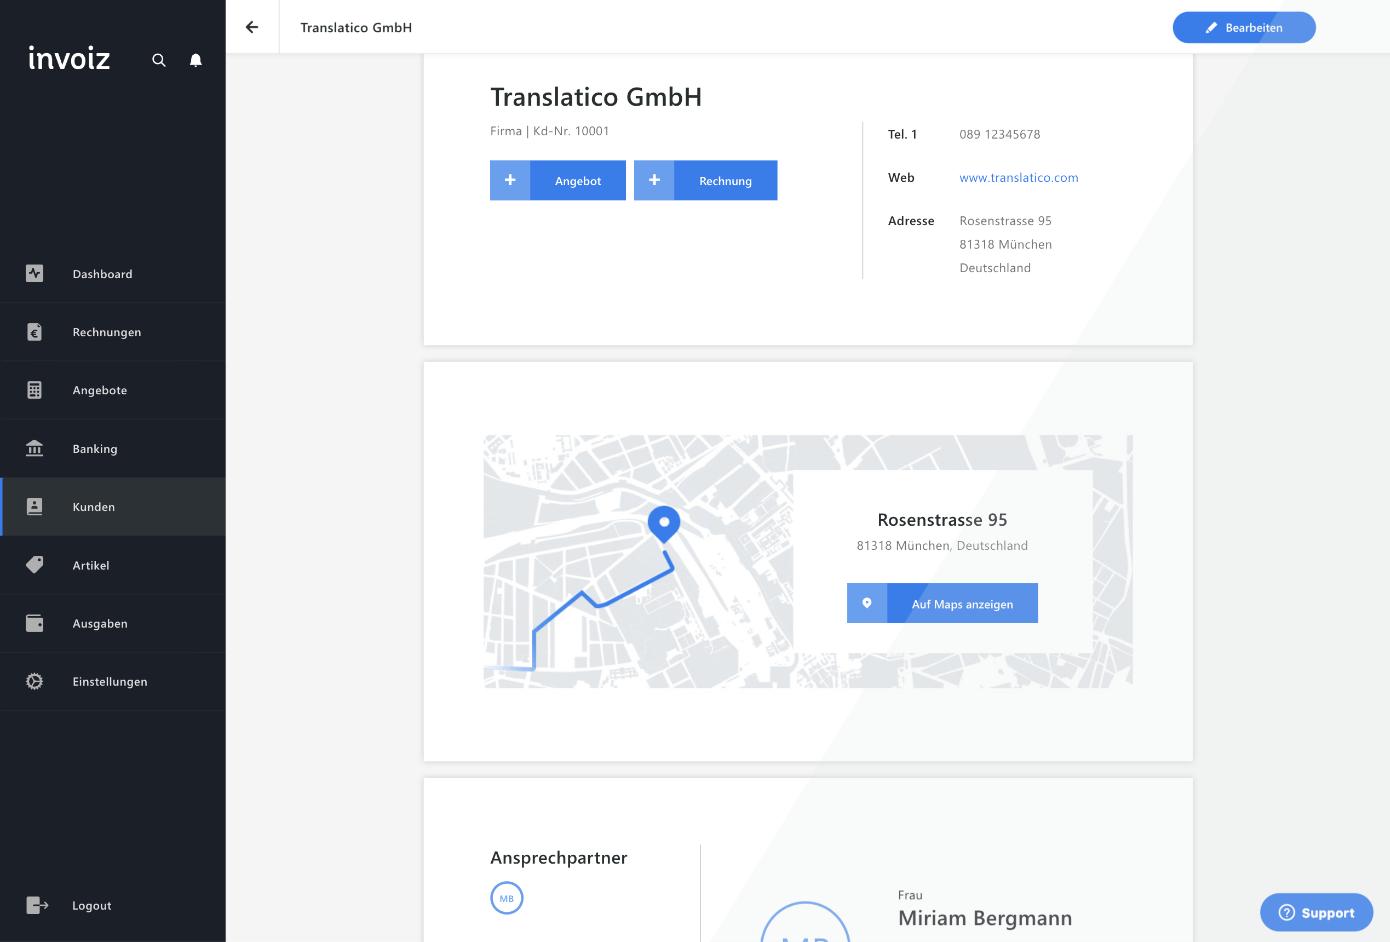 invoiz-Marketingseite_Kunden-Detail-View